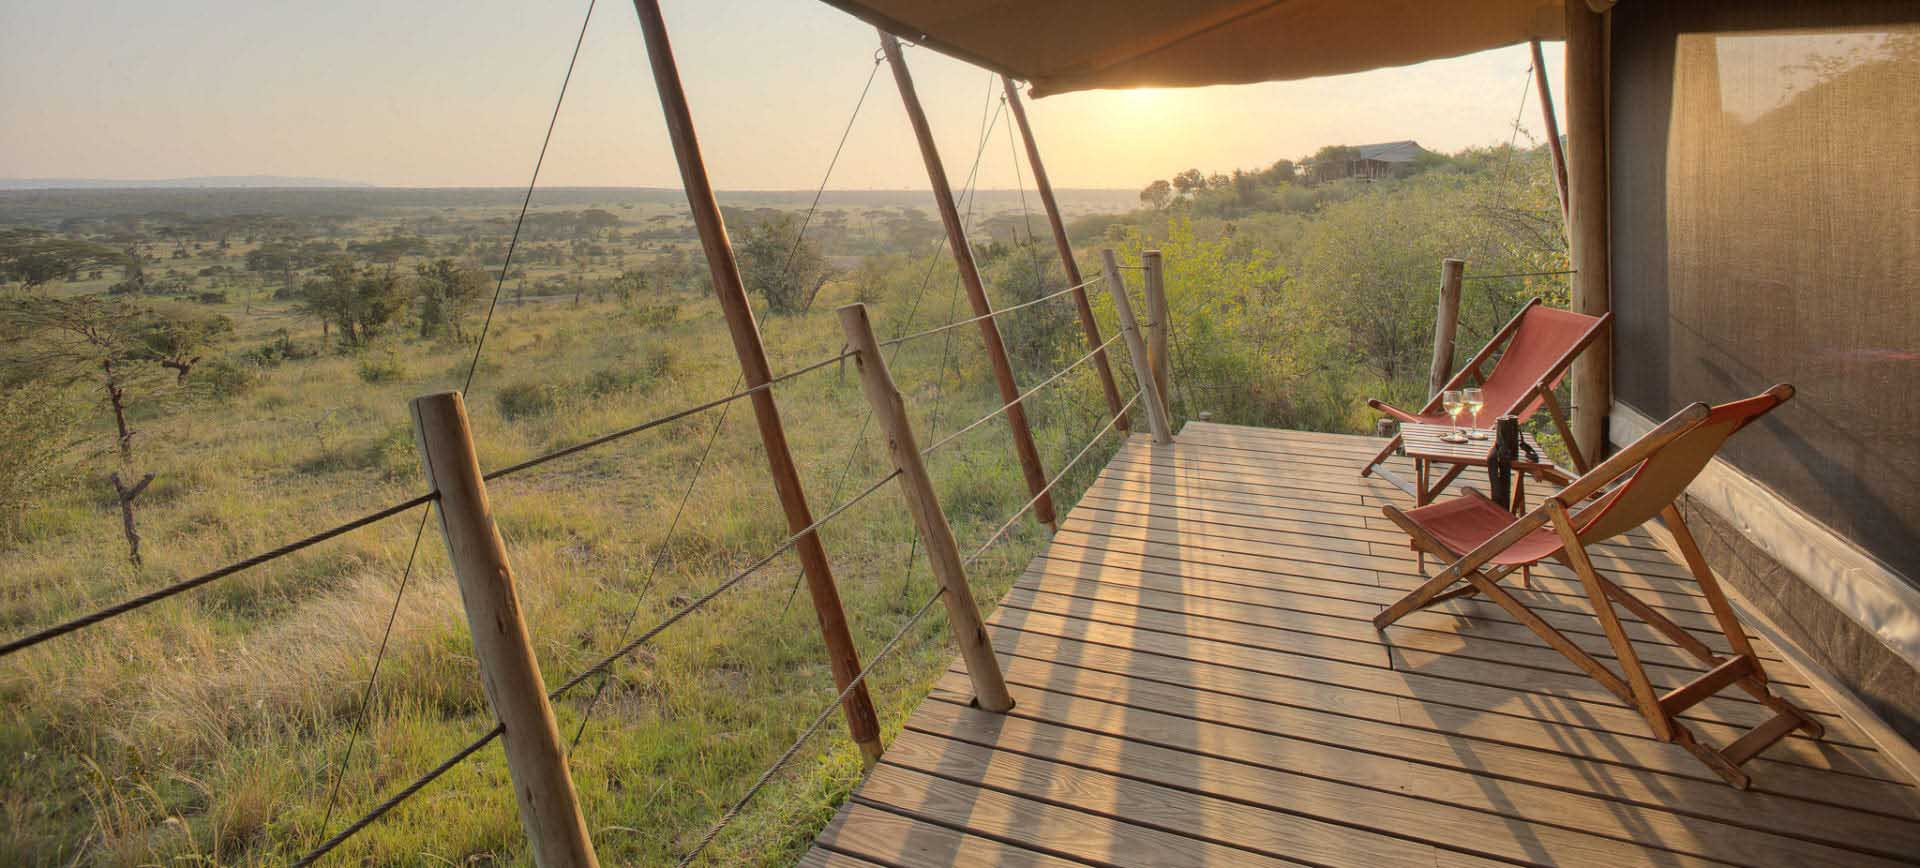 Eagle View, Basecamp Explorer Mara Naboisho